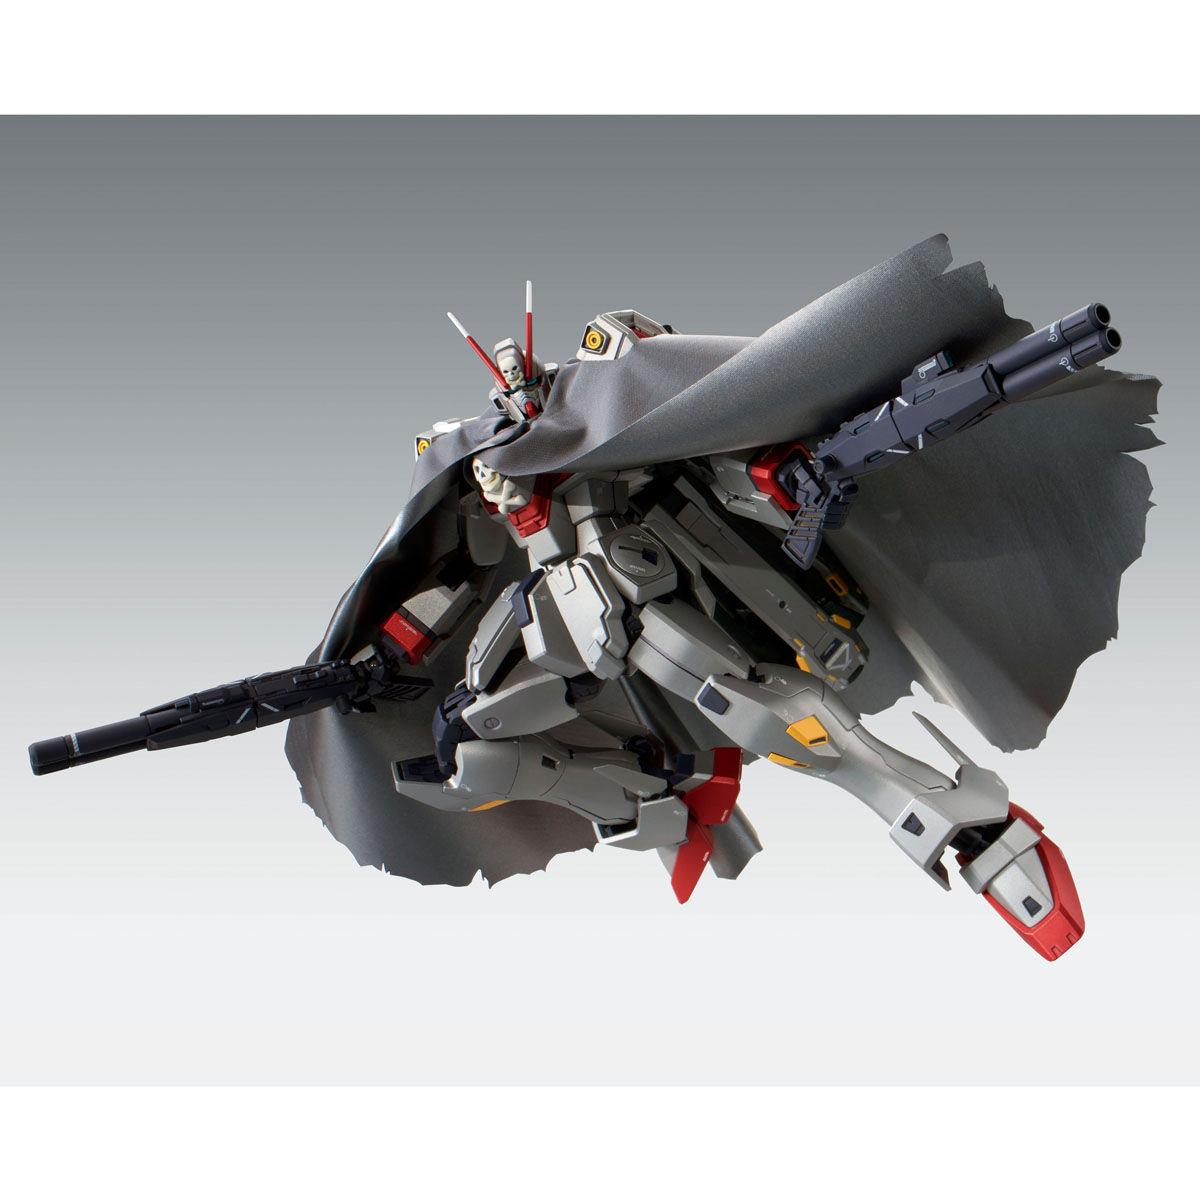 MG 1/100 XM-X0 クロスボーン・ガンダム X-0 Ver.Ka [Crossbone Gundam X-0]